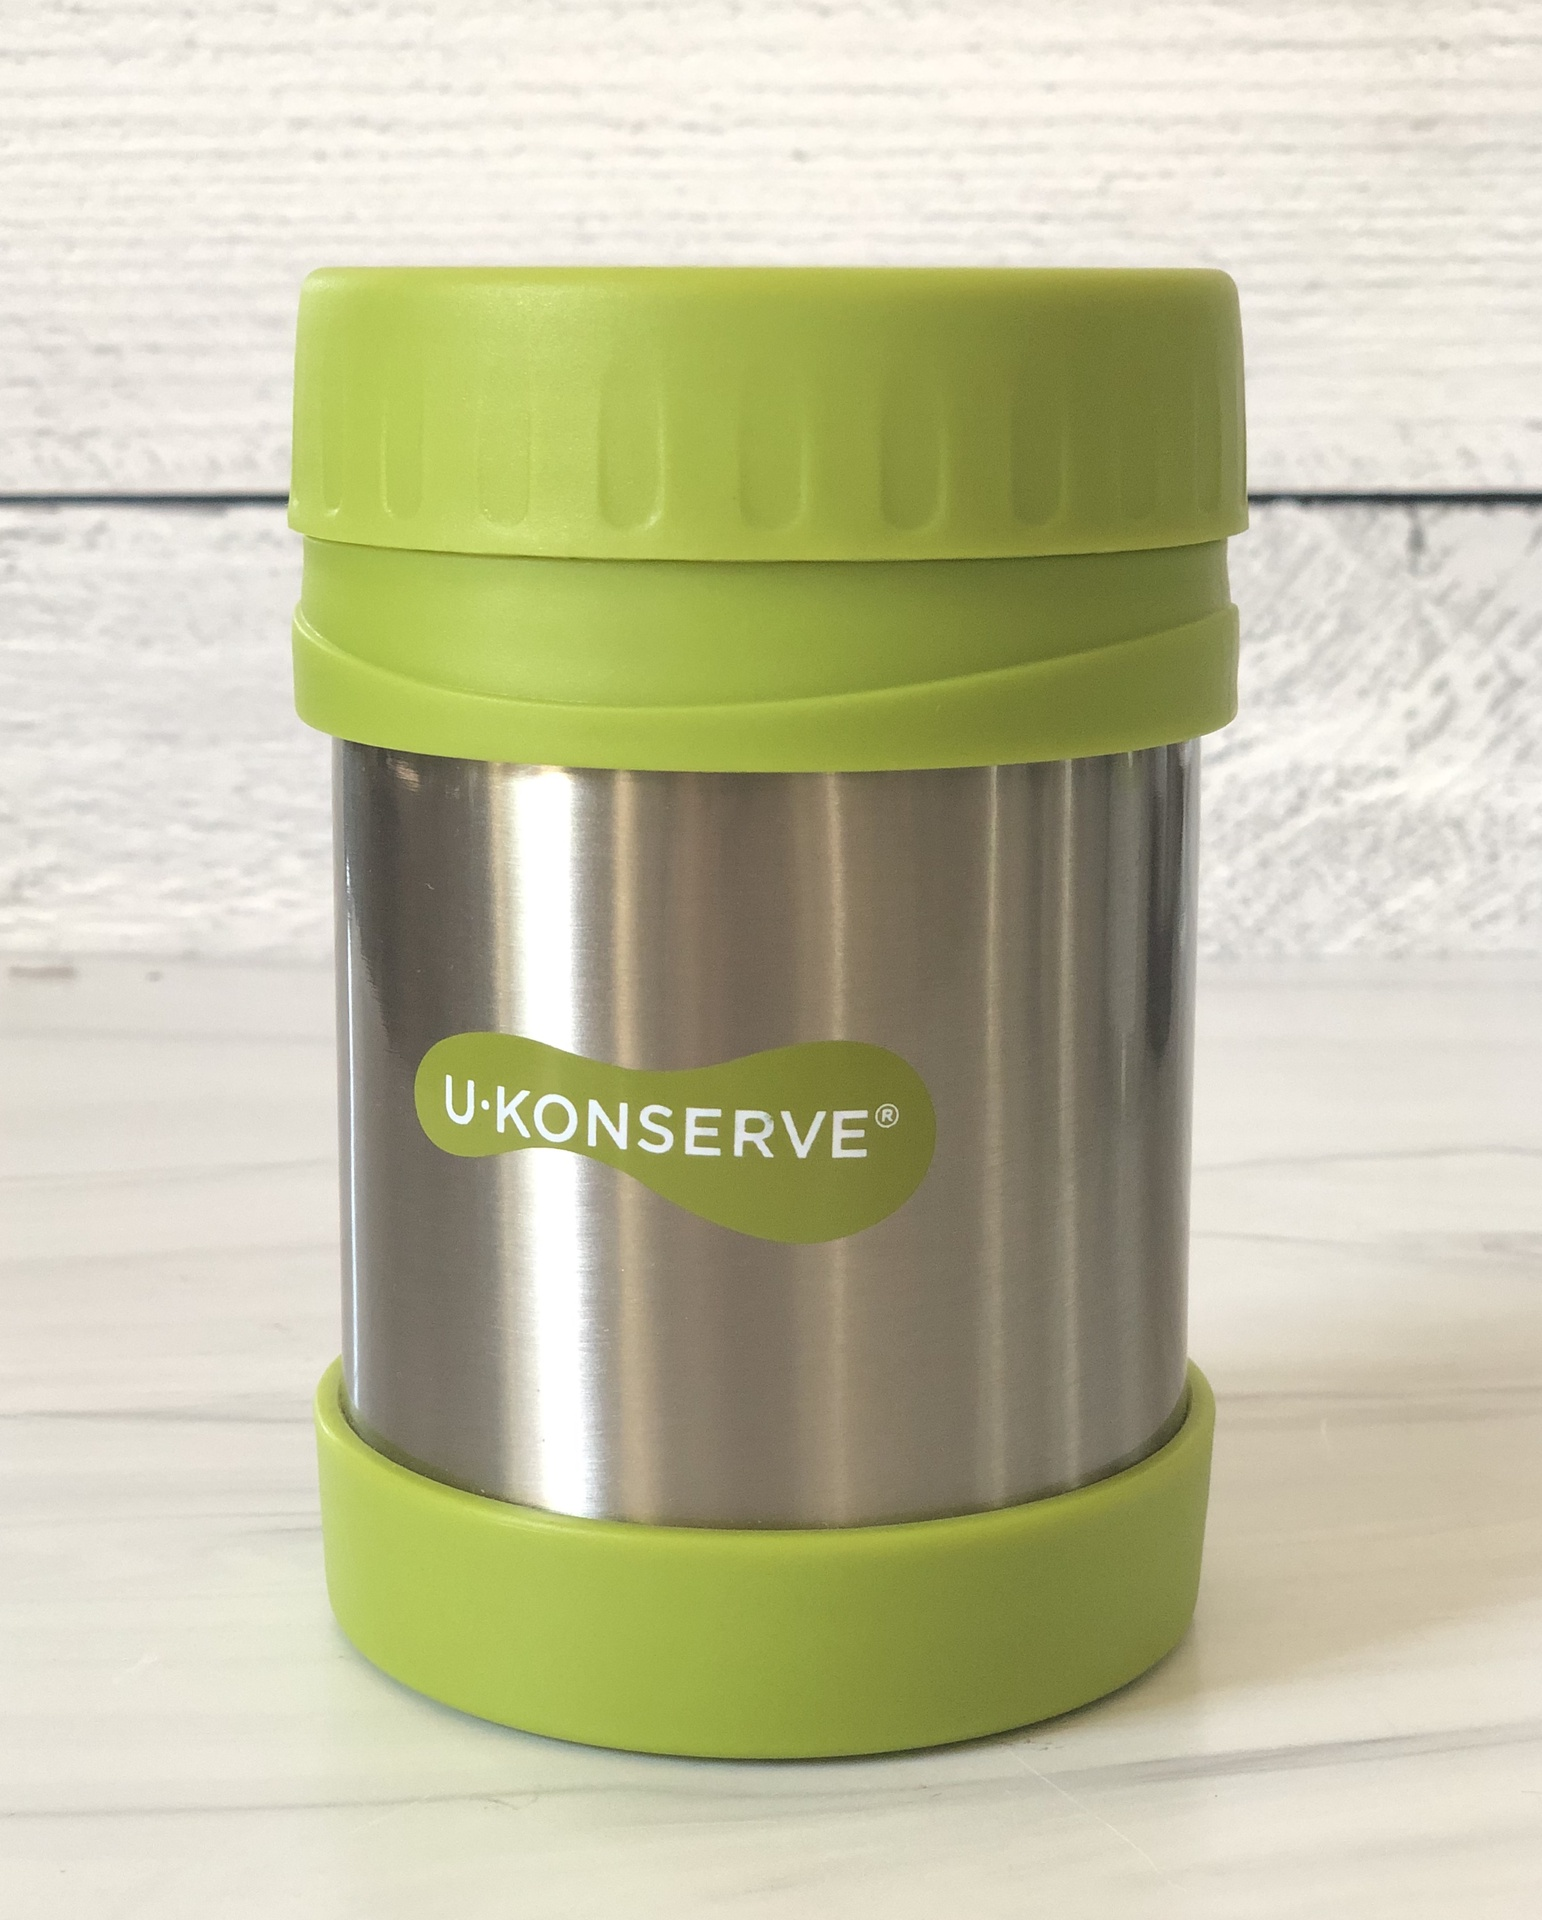 UKonserve Insulated Food Jar, 12oz